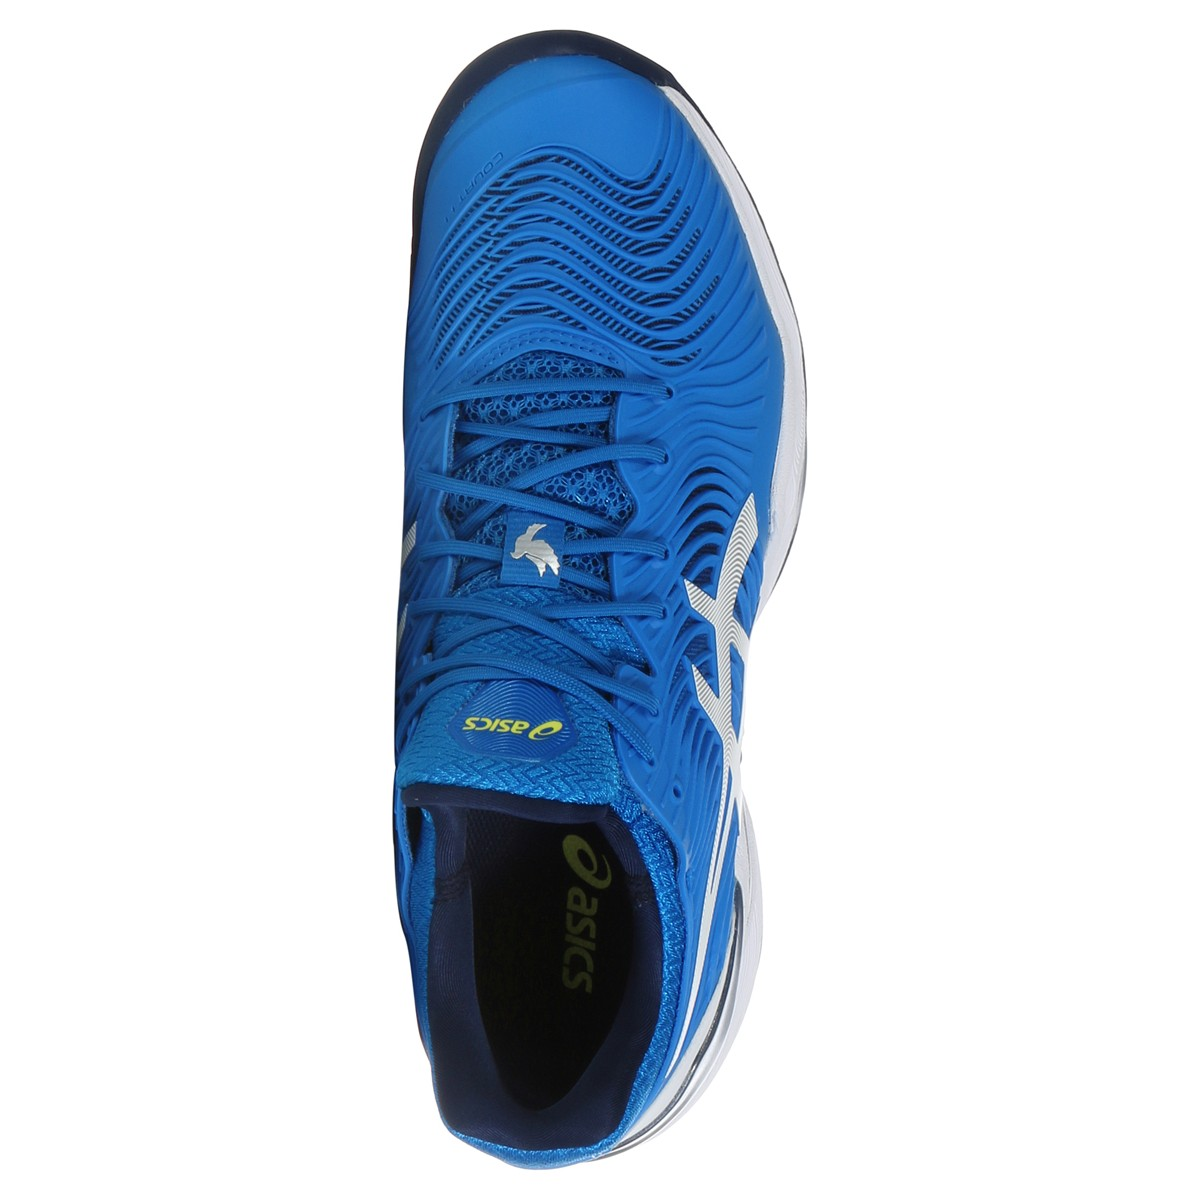 Chaussures Asics Court FF Toutes Surfaces